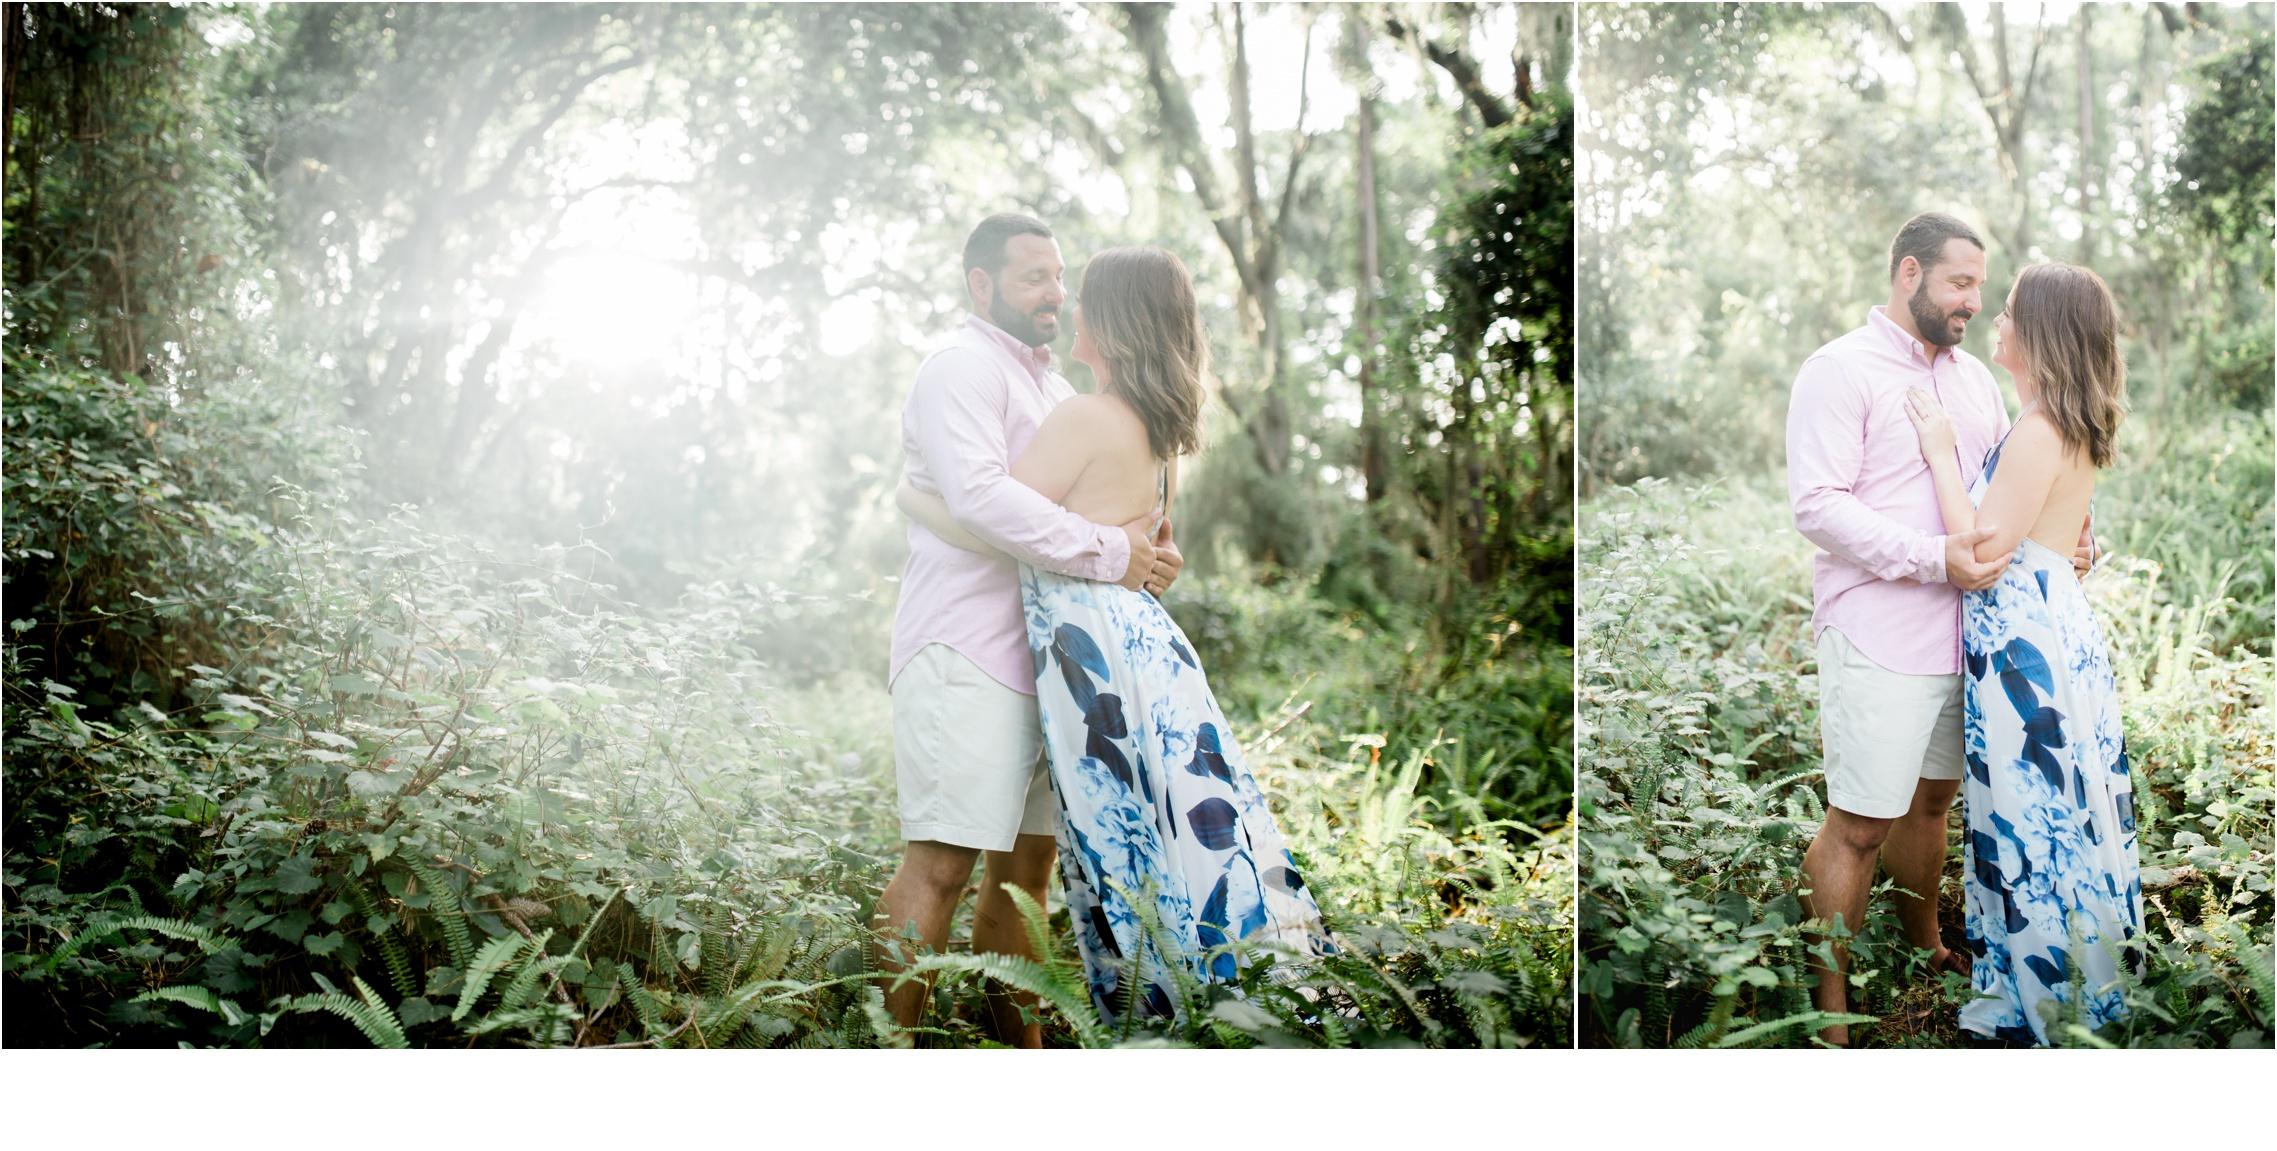 Rainey_Gregg_Photography_St._Simons_Island_Georgia_California_Wedding_Portrait_Photography_0142.jpg